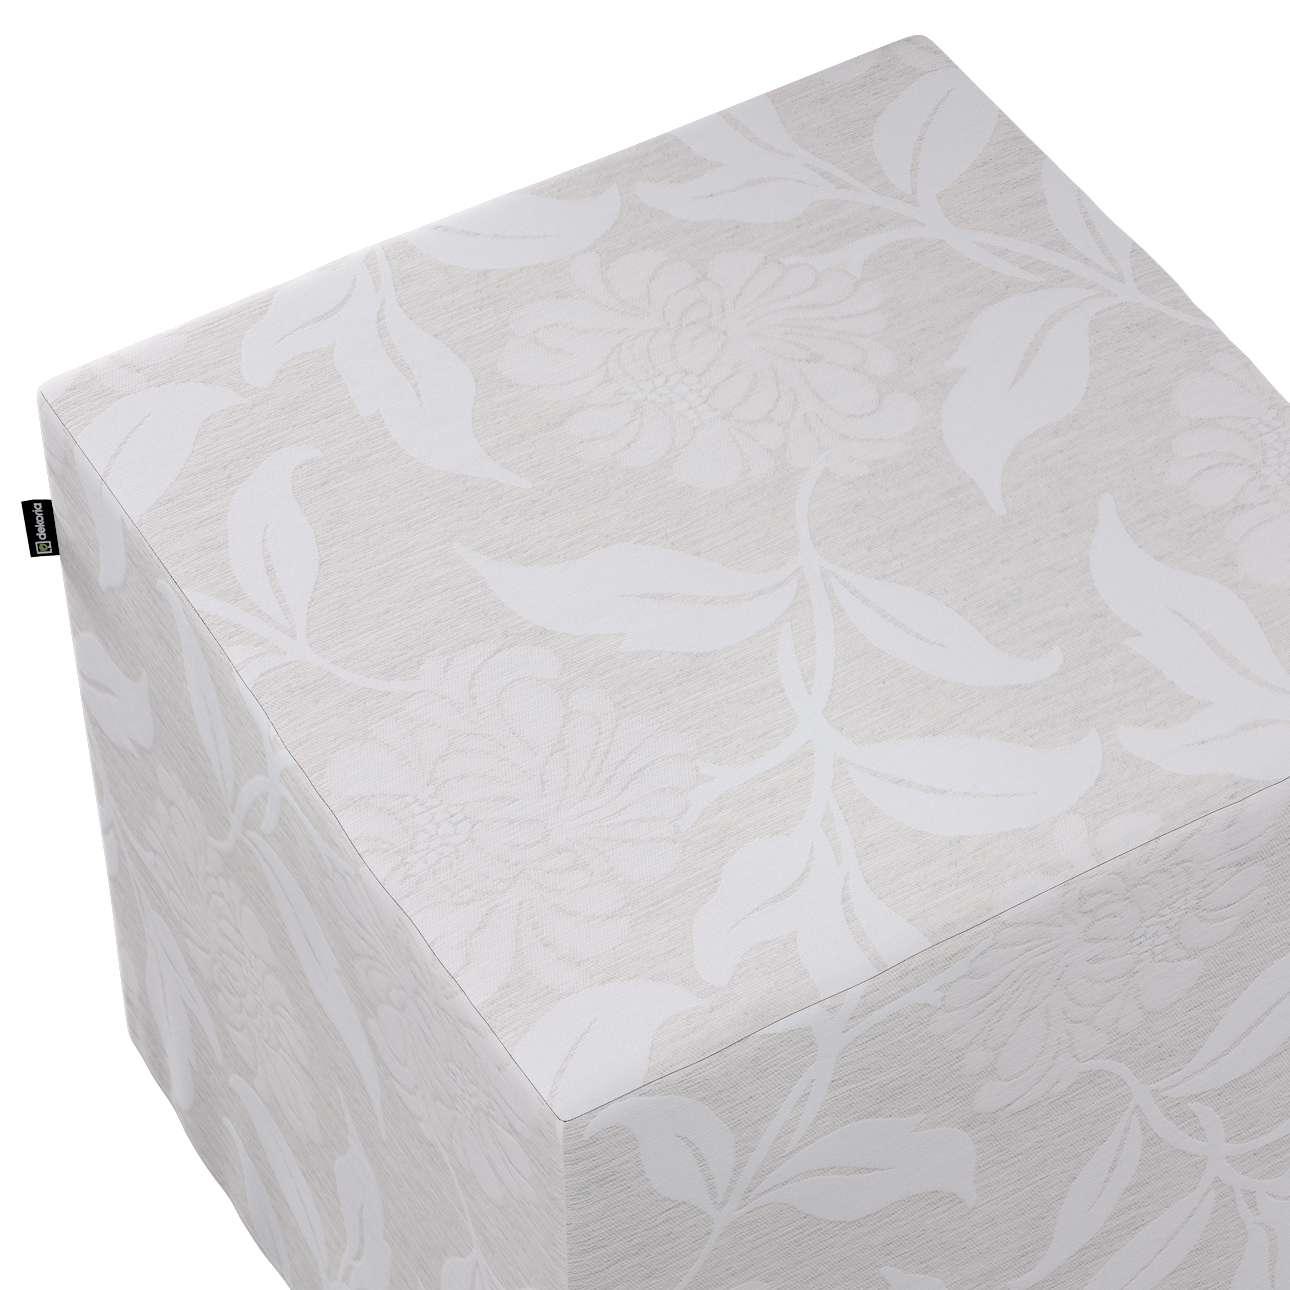 Sedák Cube - kostka pevná 40x40x40 v kolekci Venice, látka: 140-51